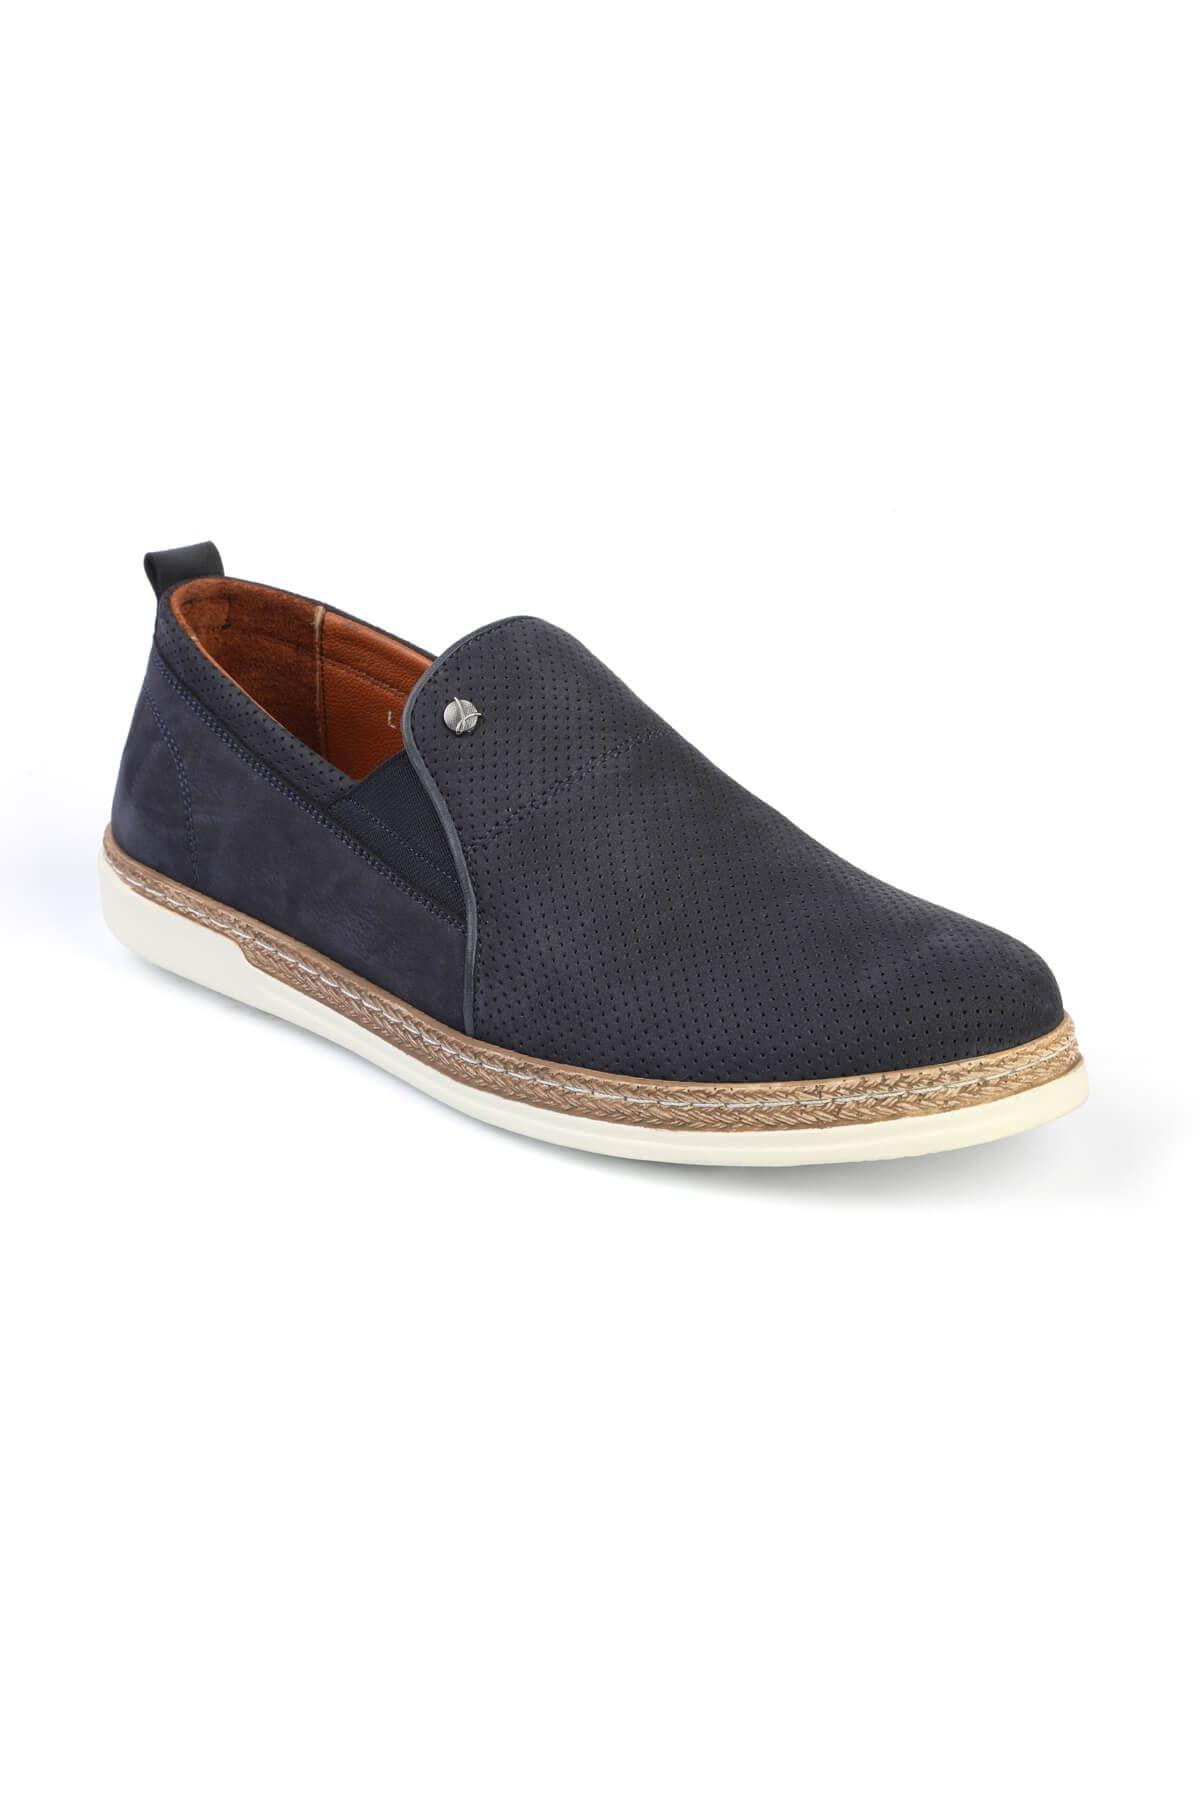 Libero C770 Navy Blue Casual Shoes